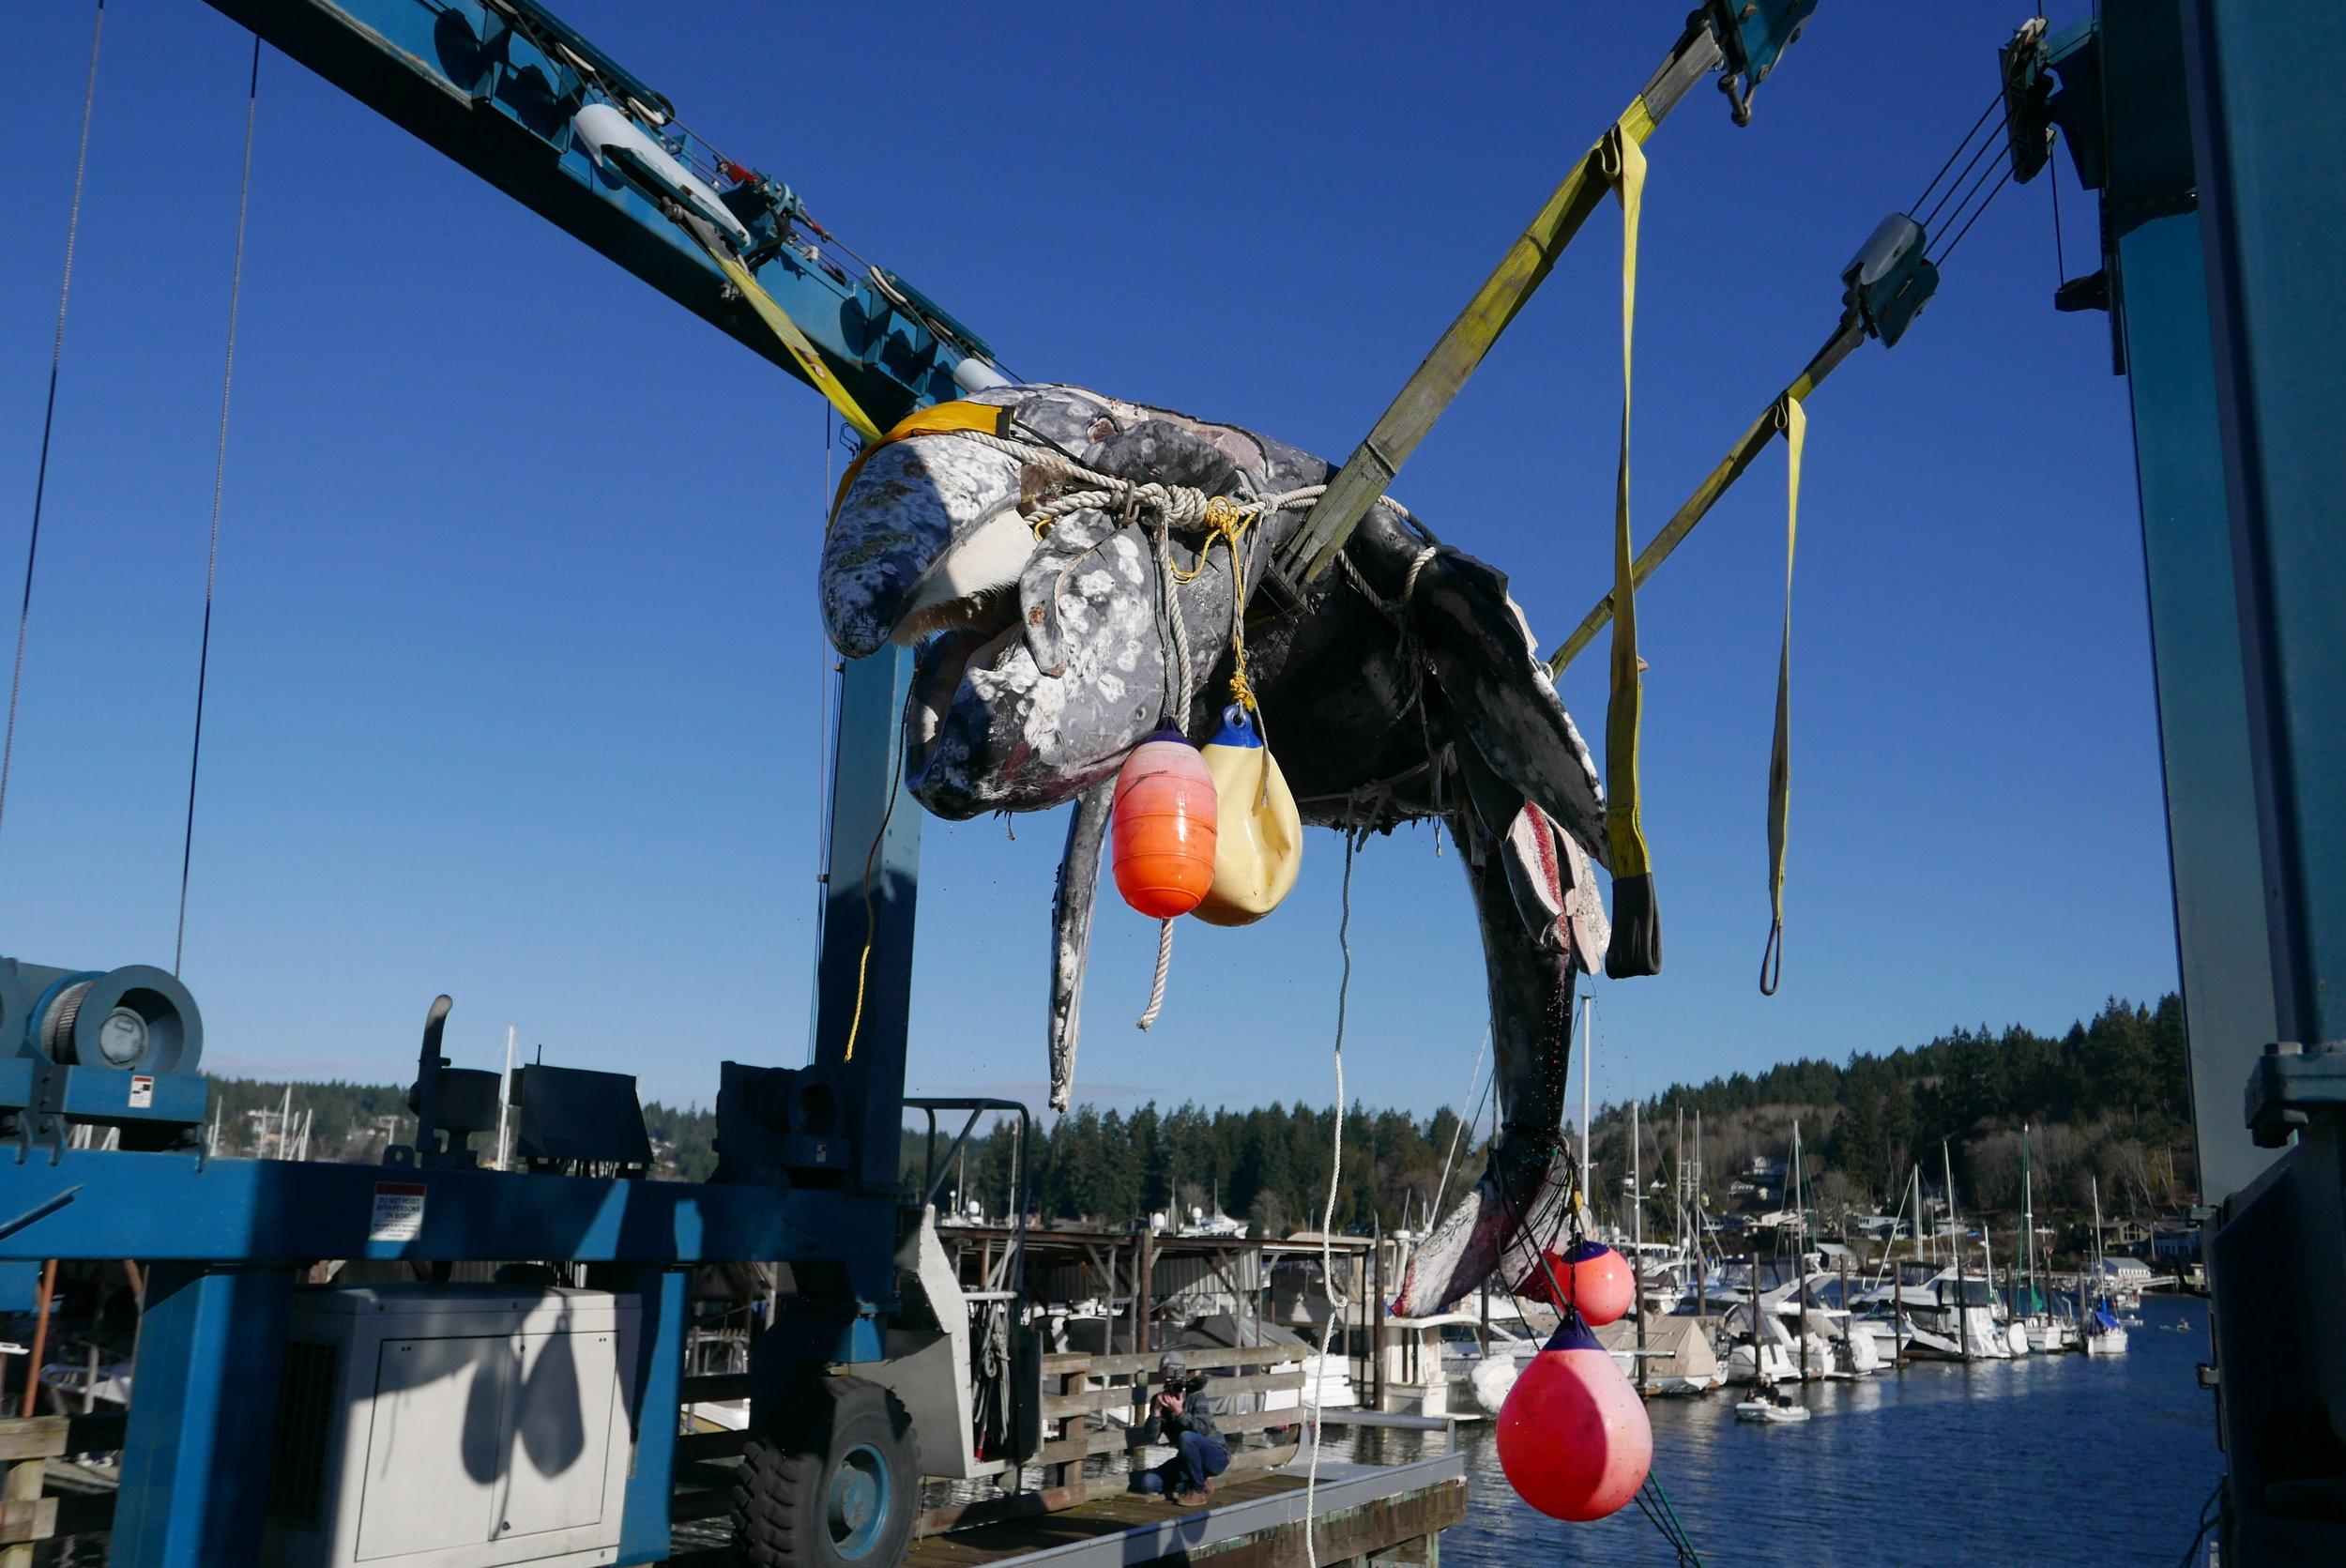 Hoisting the Whale